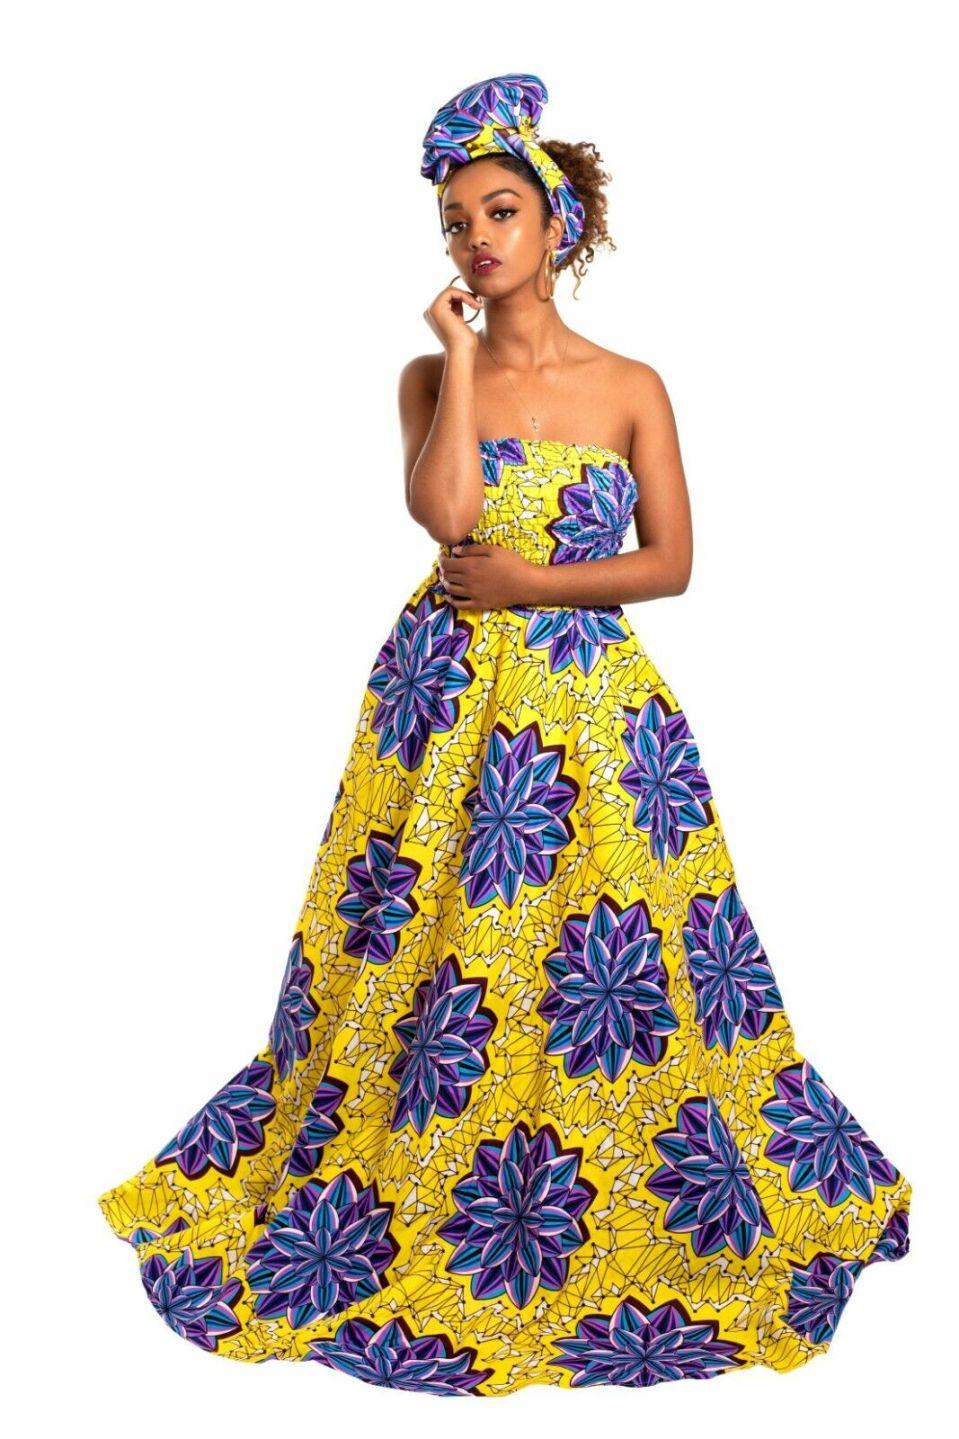 New Women's African Print Ankara Akuyo Maxi Dress 100% Cotton Handmade Floral